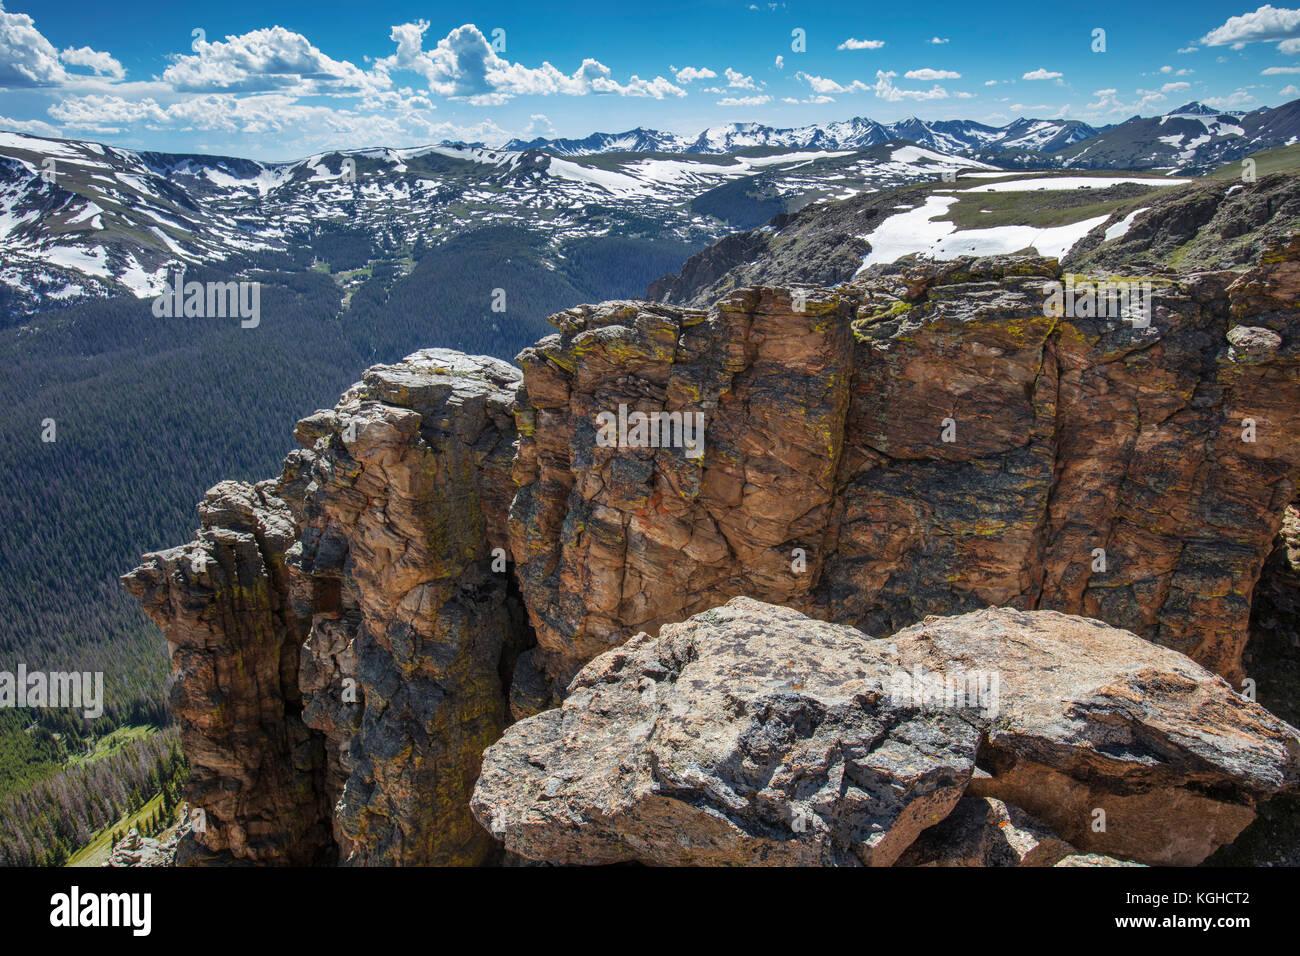 Exposed Strata, Rocky Mountain National Park, Colorado - Stock Image